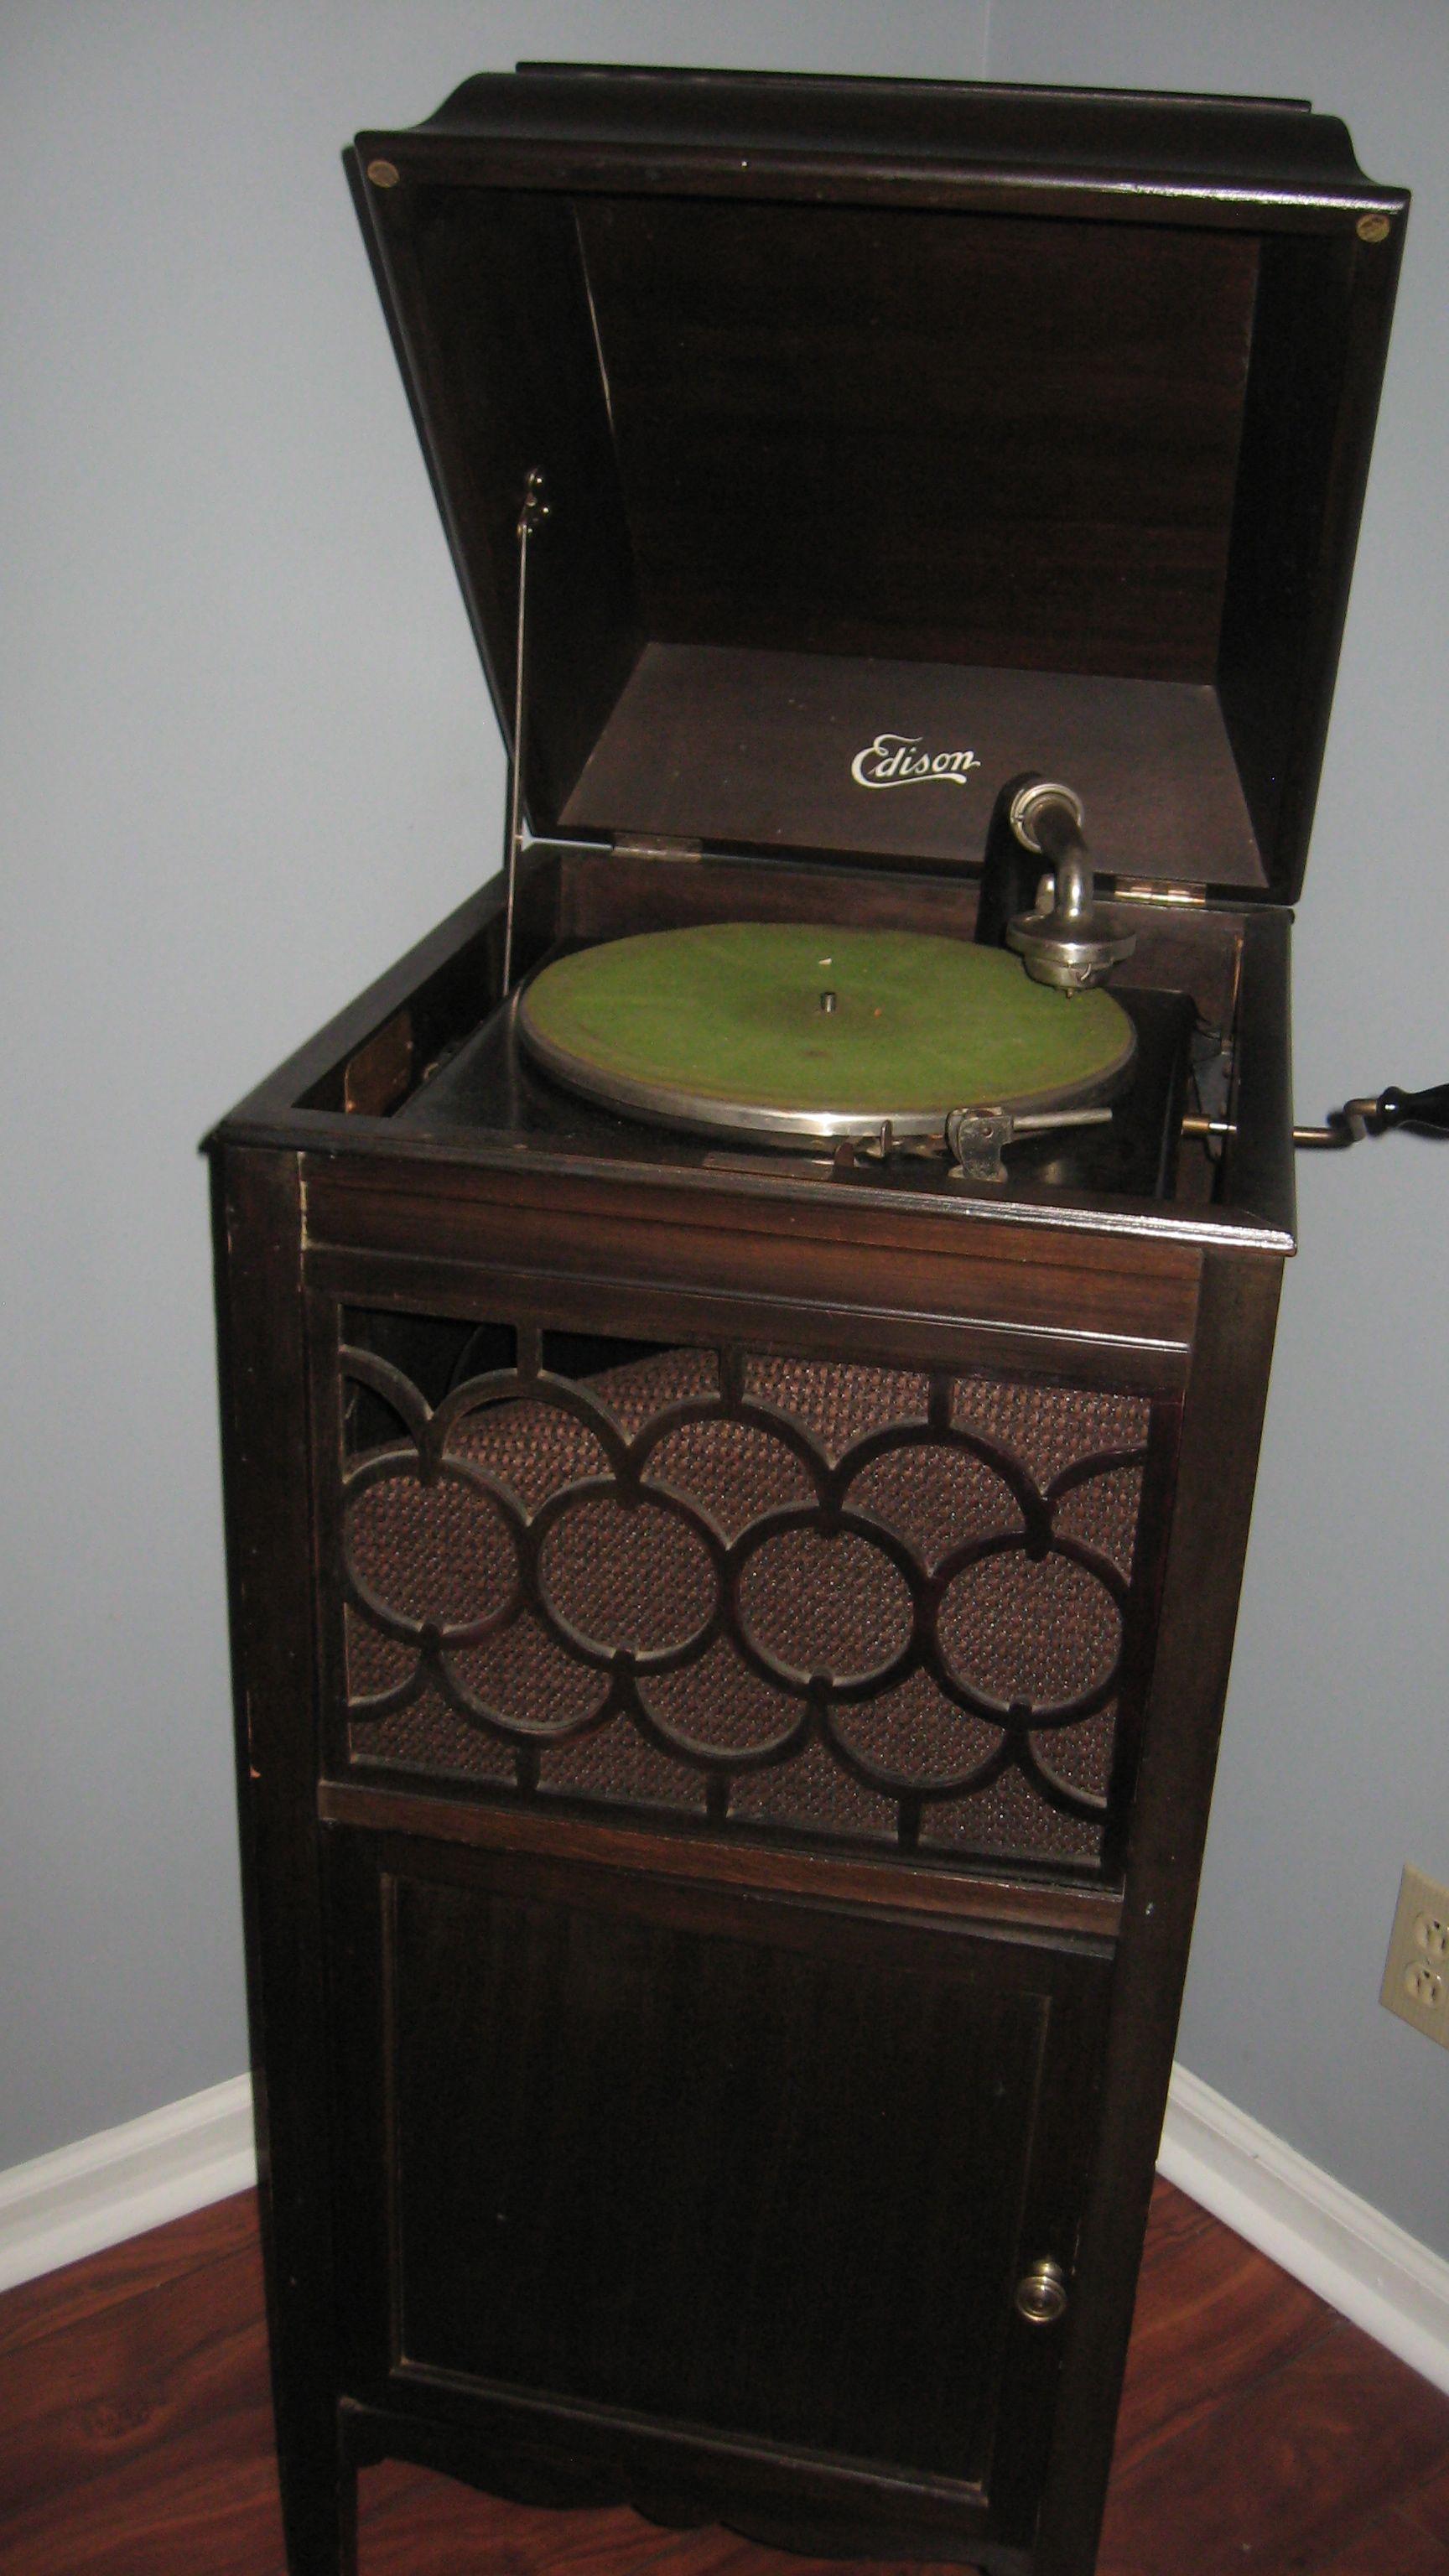 Edison Victrola antique appraisal   InstAppraisal